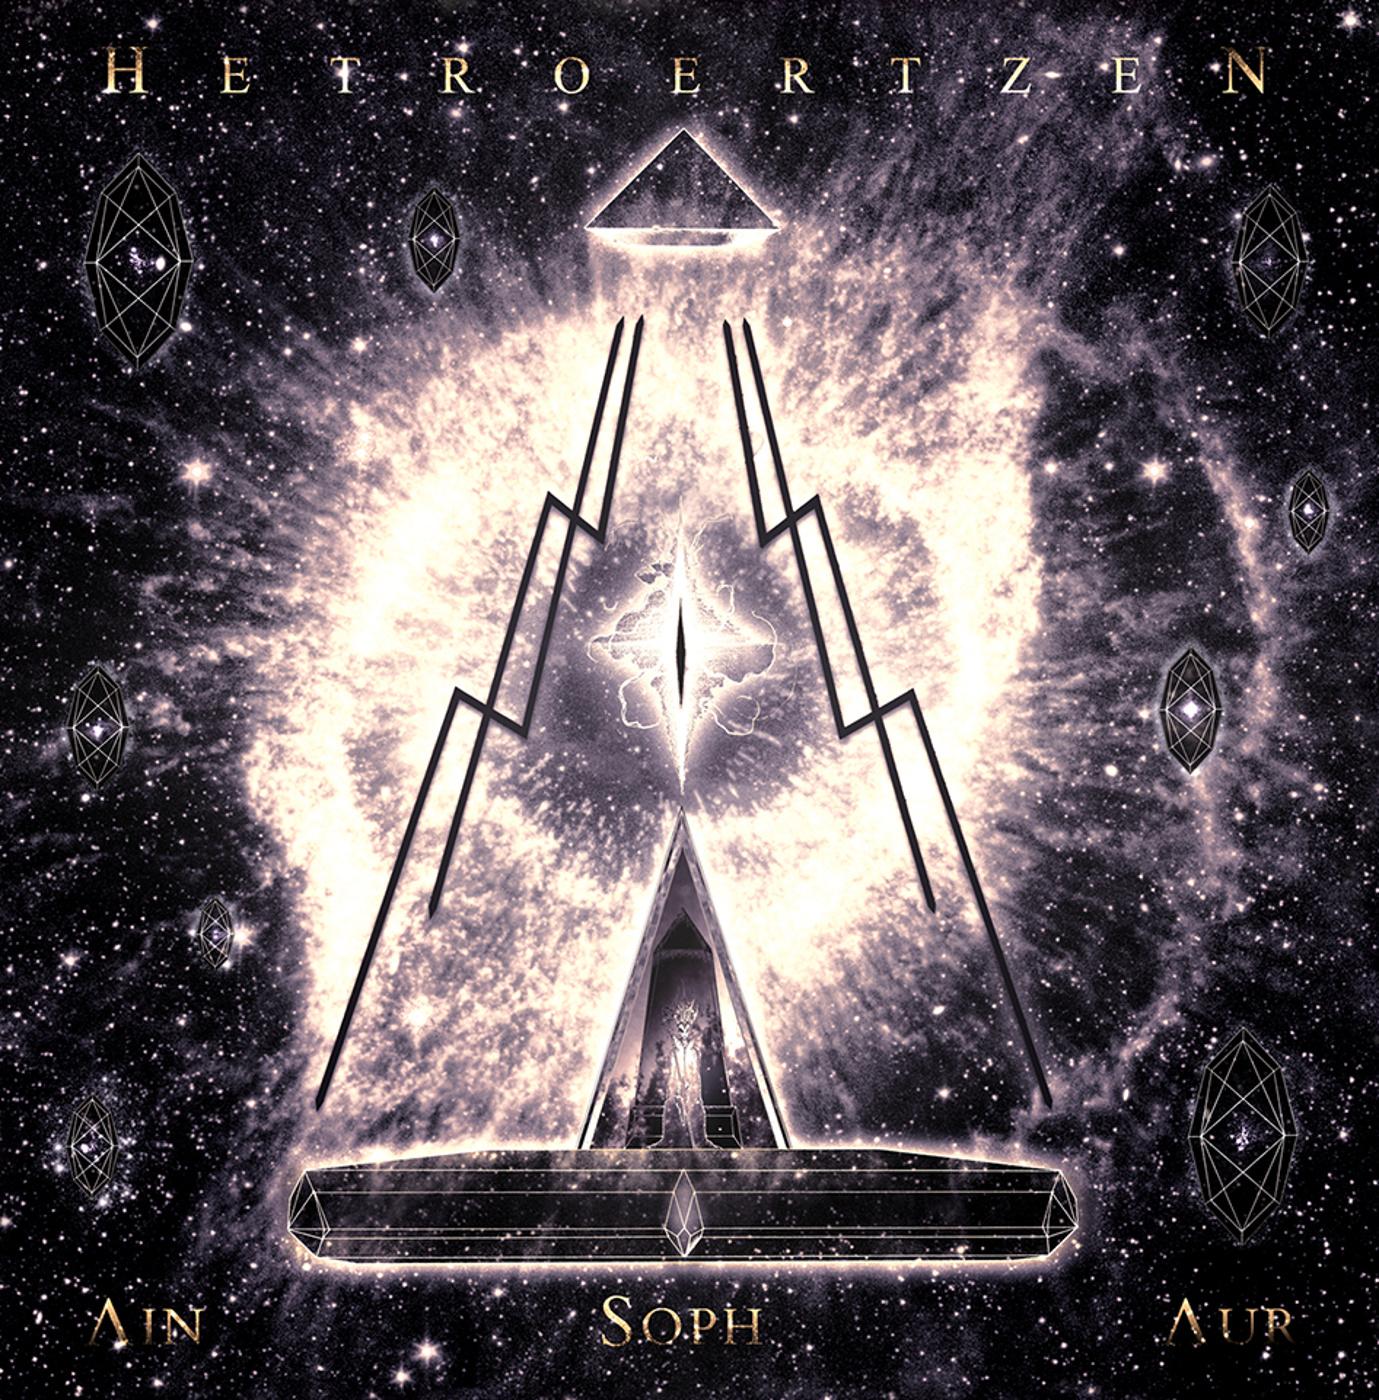 Ain-Soph-Aur-cover art